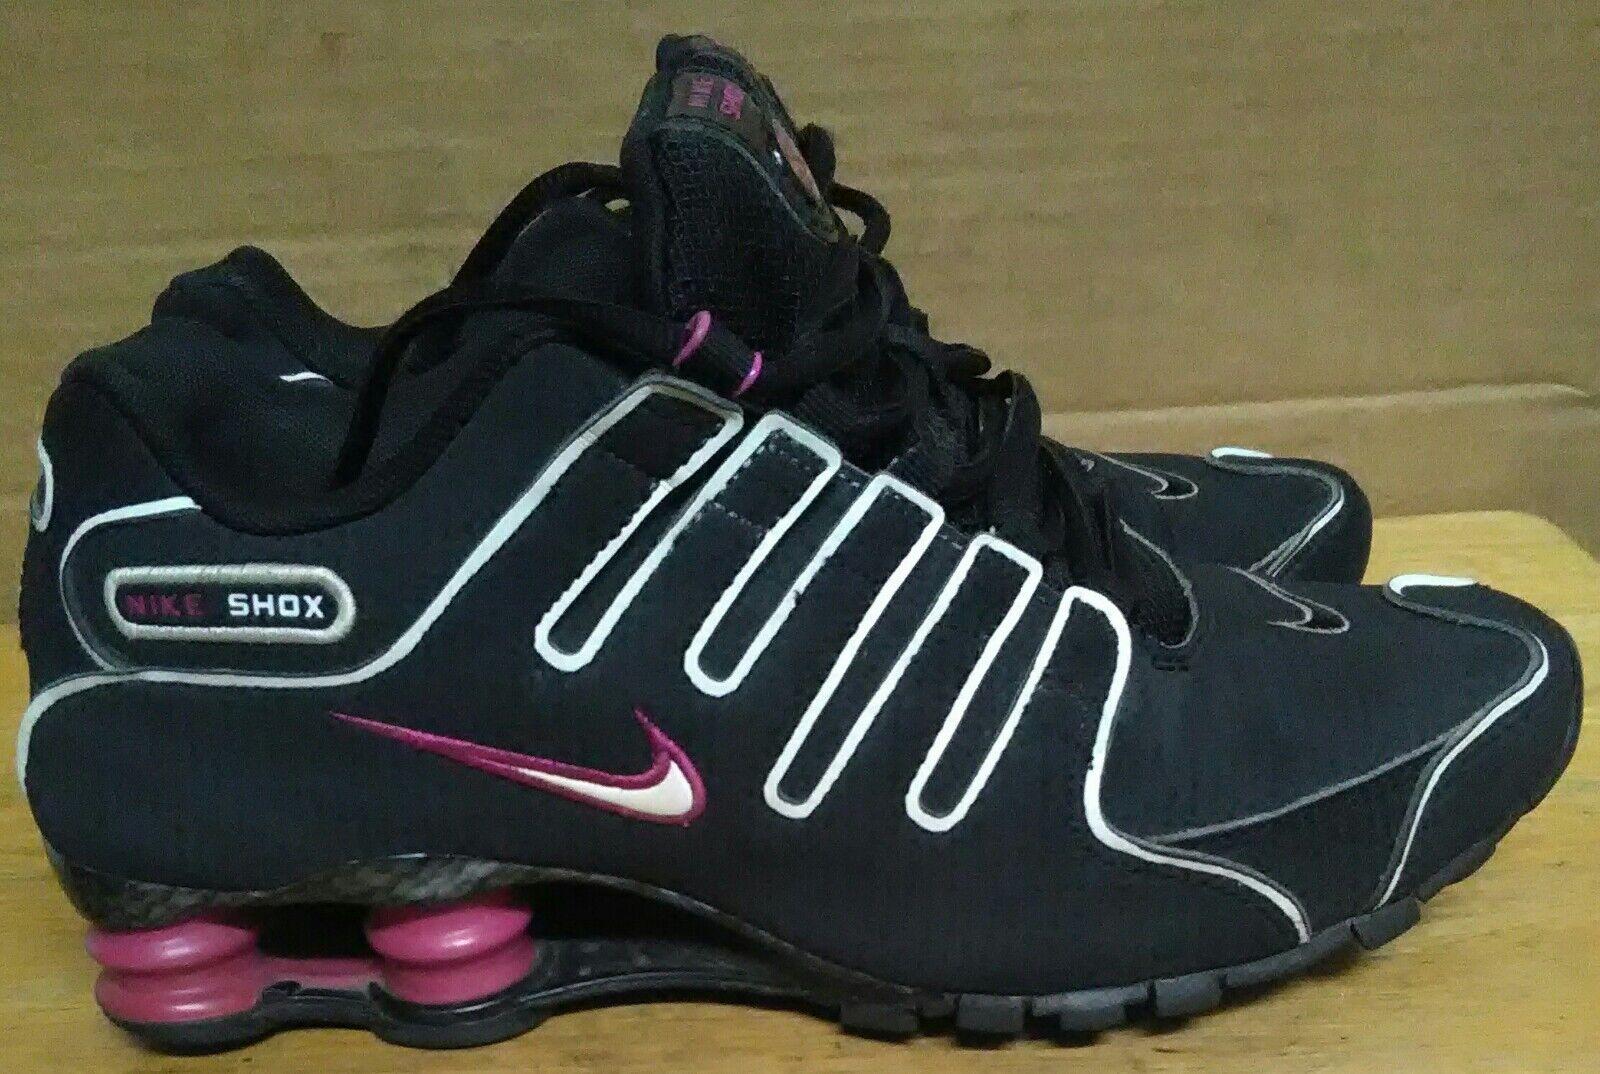 2018 Mujeres Nike Zapatos. Shox NZ 488312-011 UE Negro/Marino/Rave Rosa Zapatos. Nike 165257